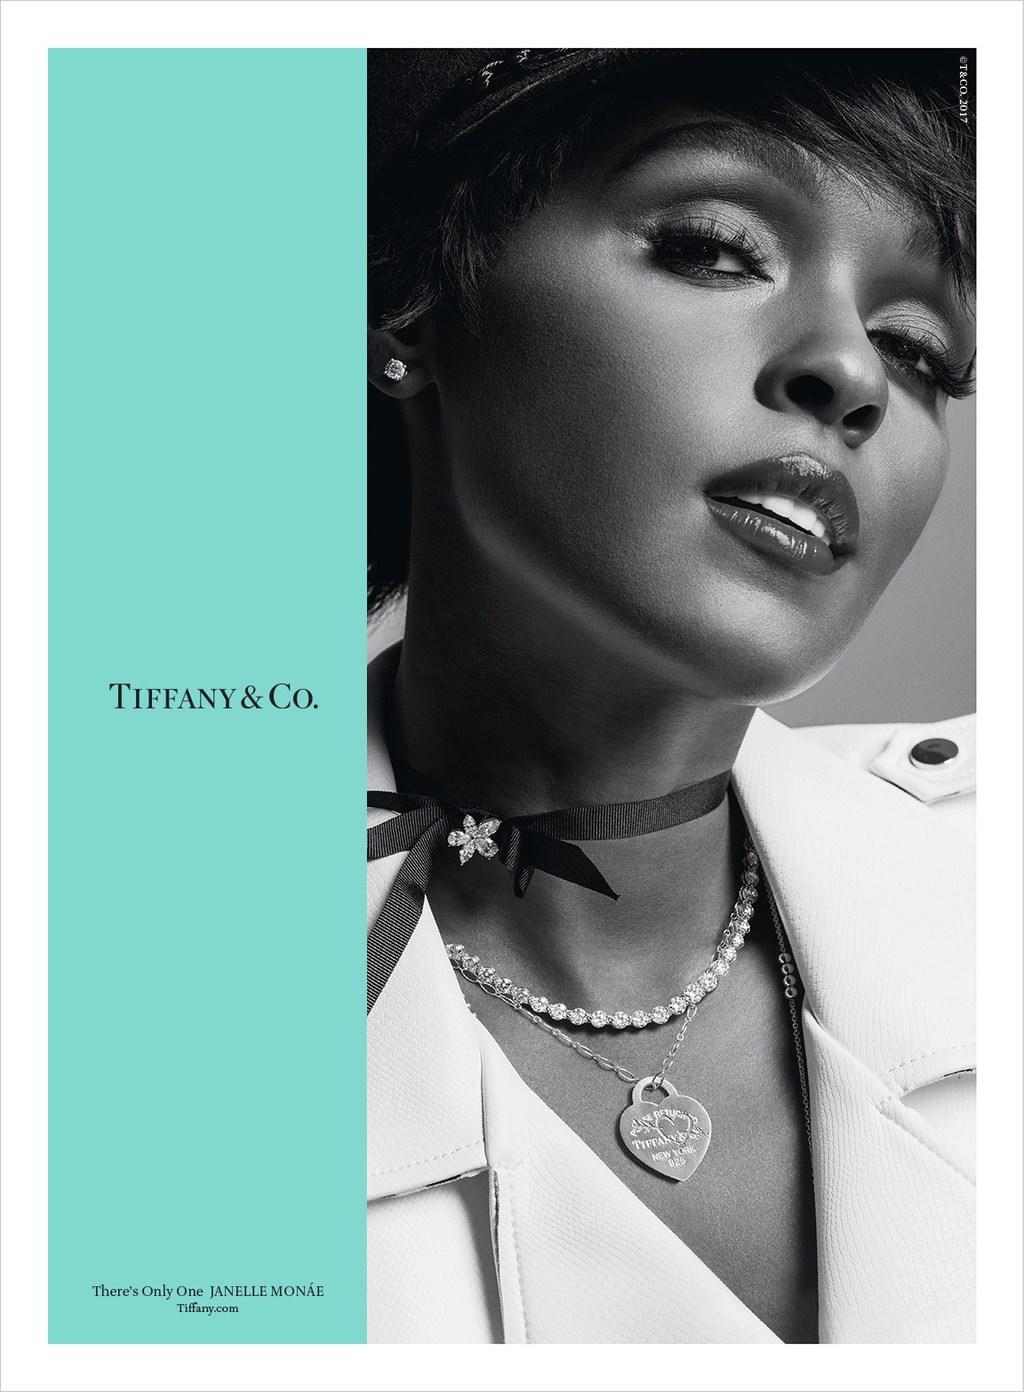 Tiffany-and-co-fall-2017-ad-campaign-the-impression-009